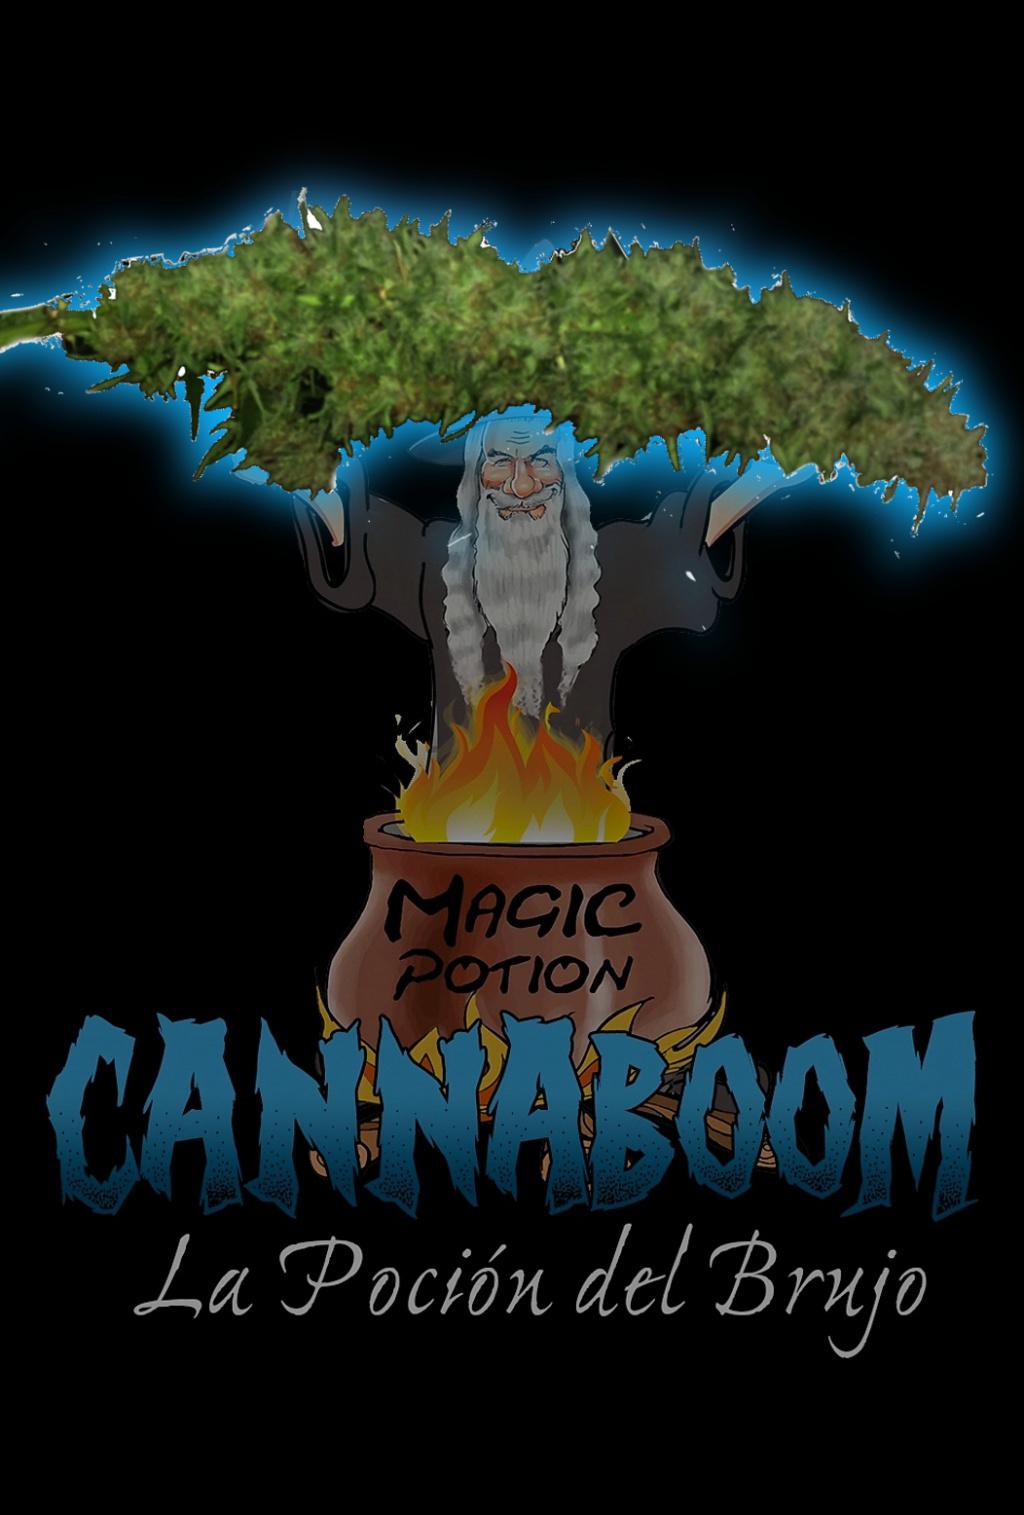 Crystal Candy® de Sweet Seeds® + Cannaboom - Página 2 Sin_no10